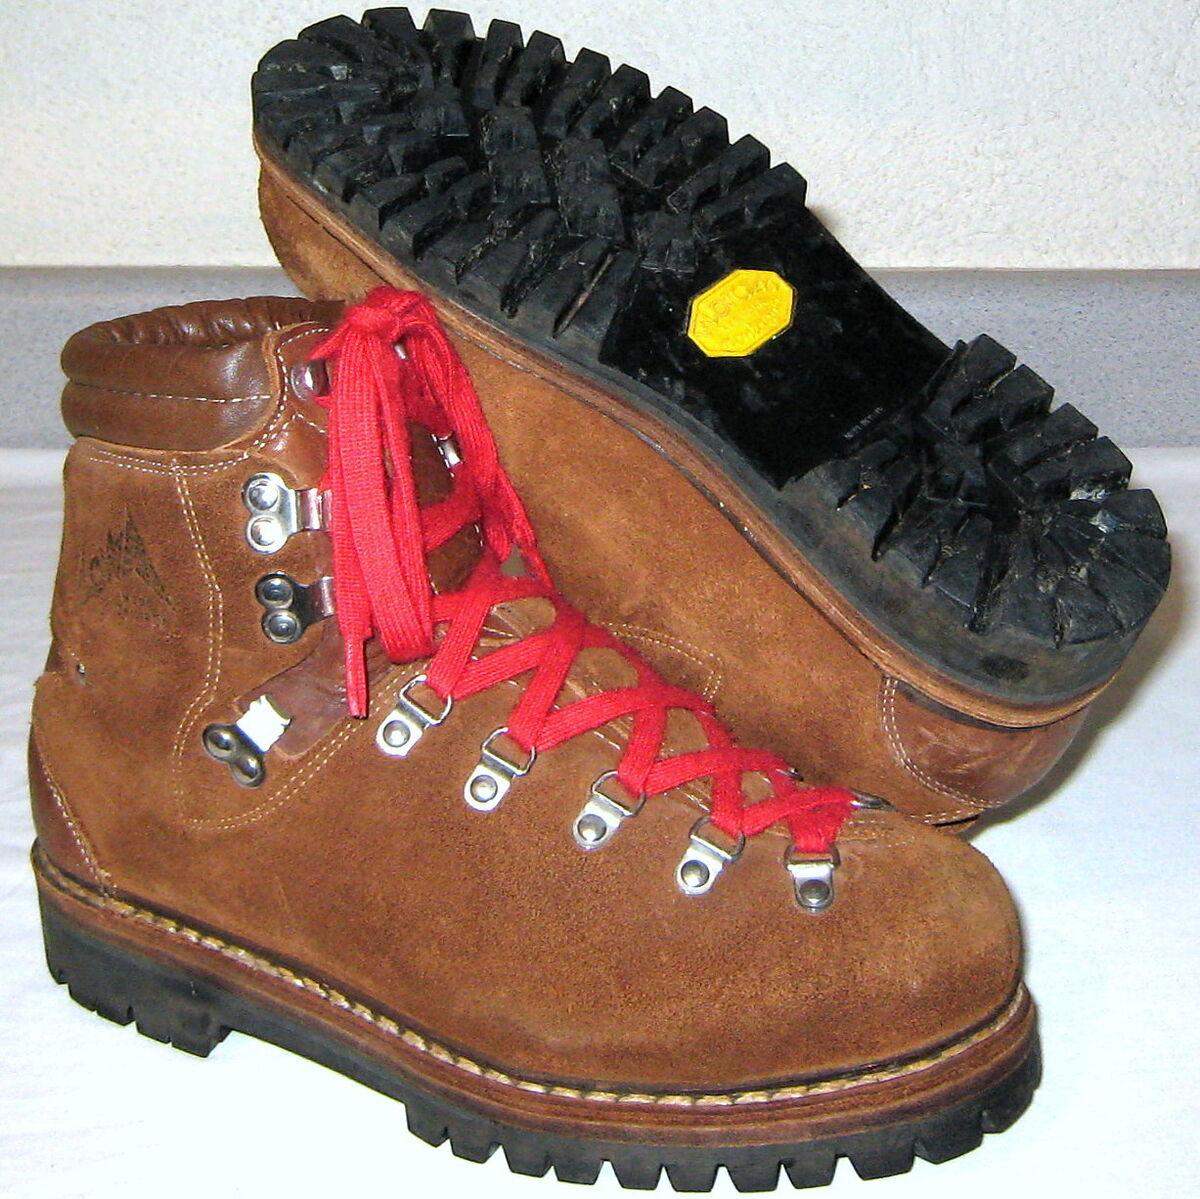 lowa vintage leather hiking boots mens sz 6 5